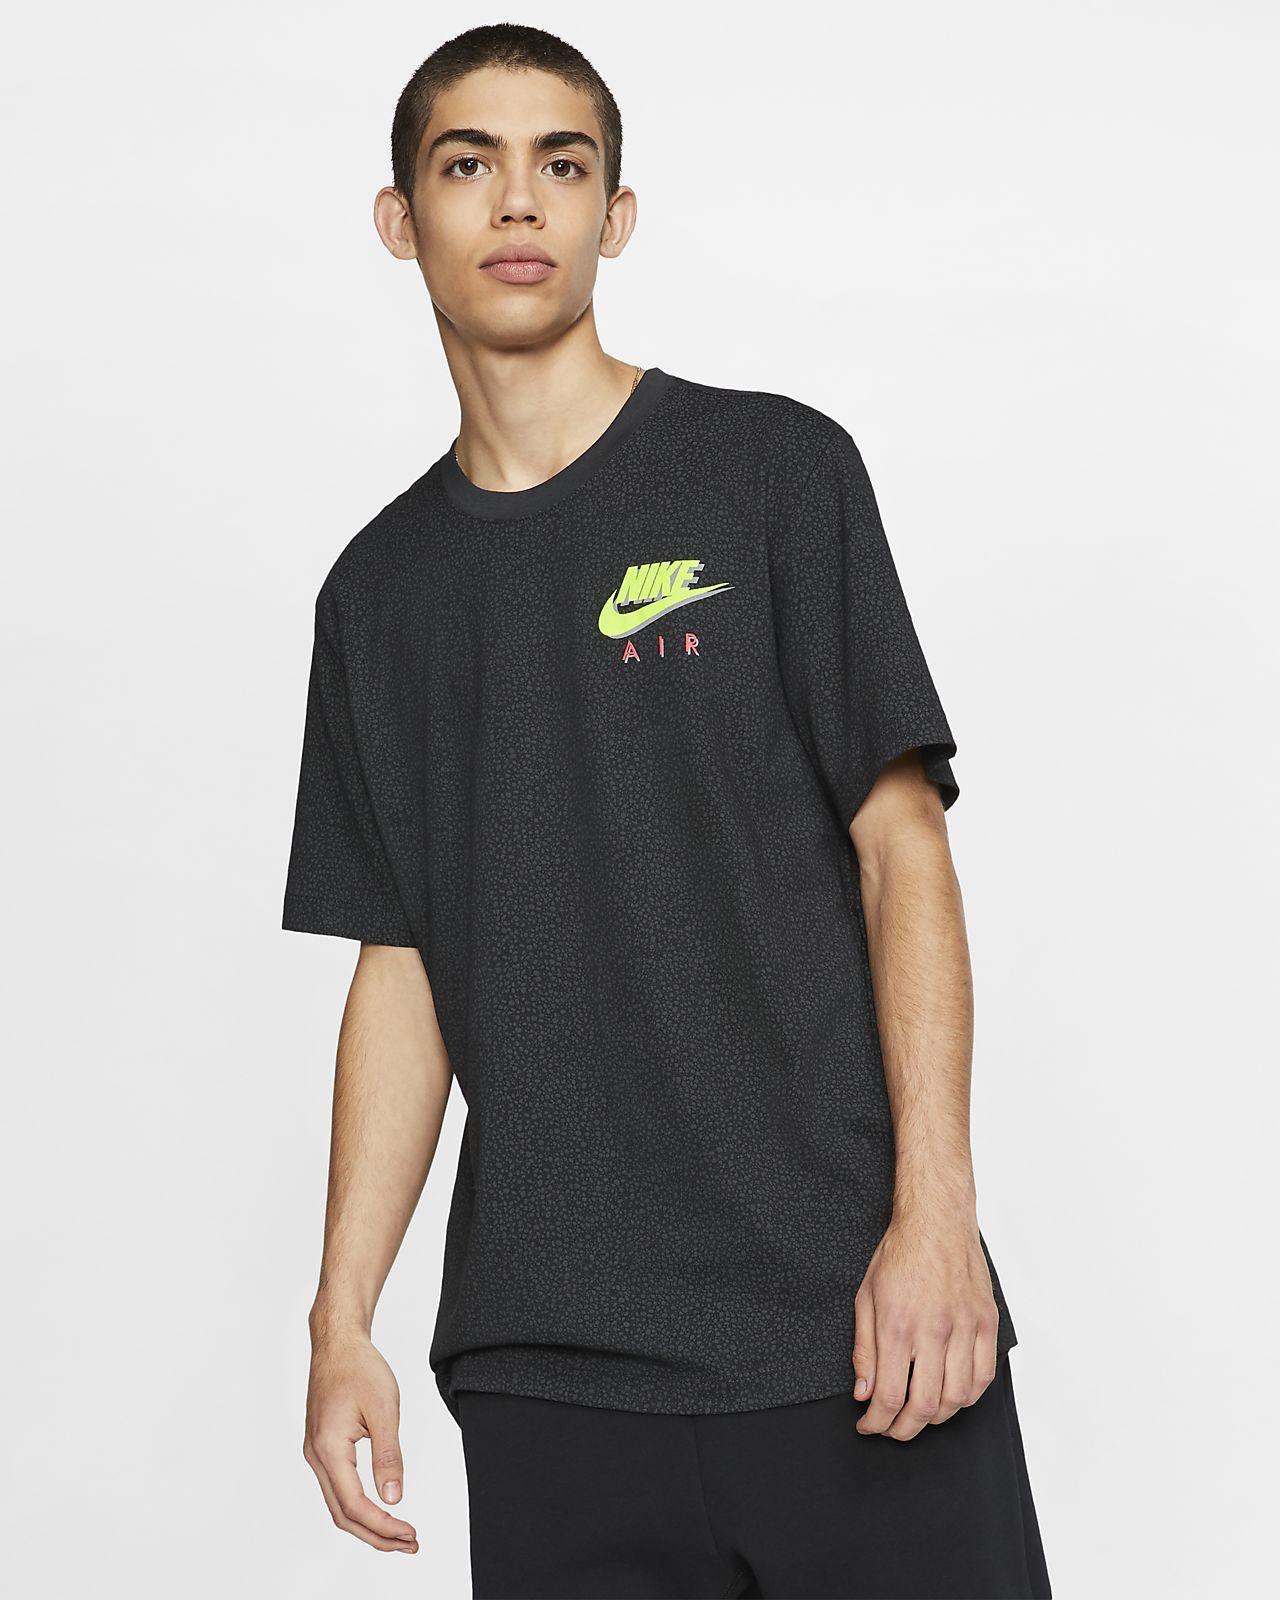 Nike Sportswear Herren T Shirt mit Print